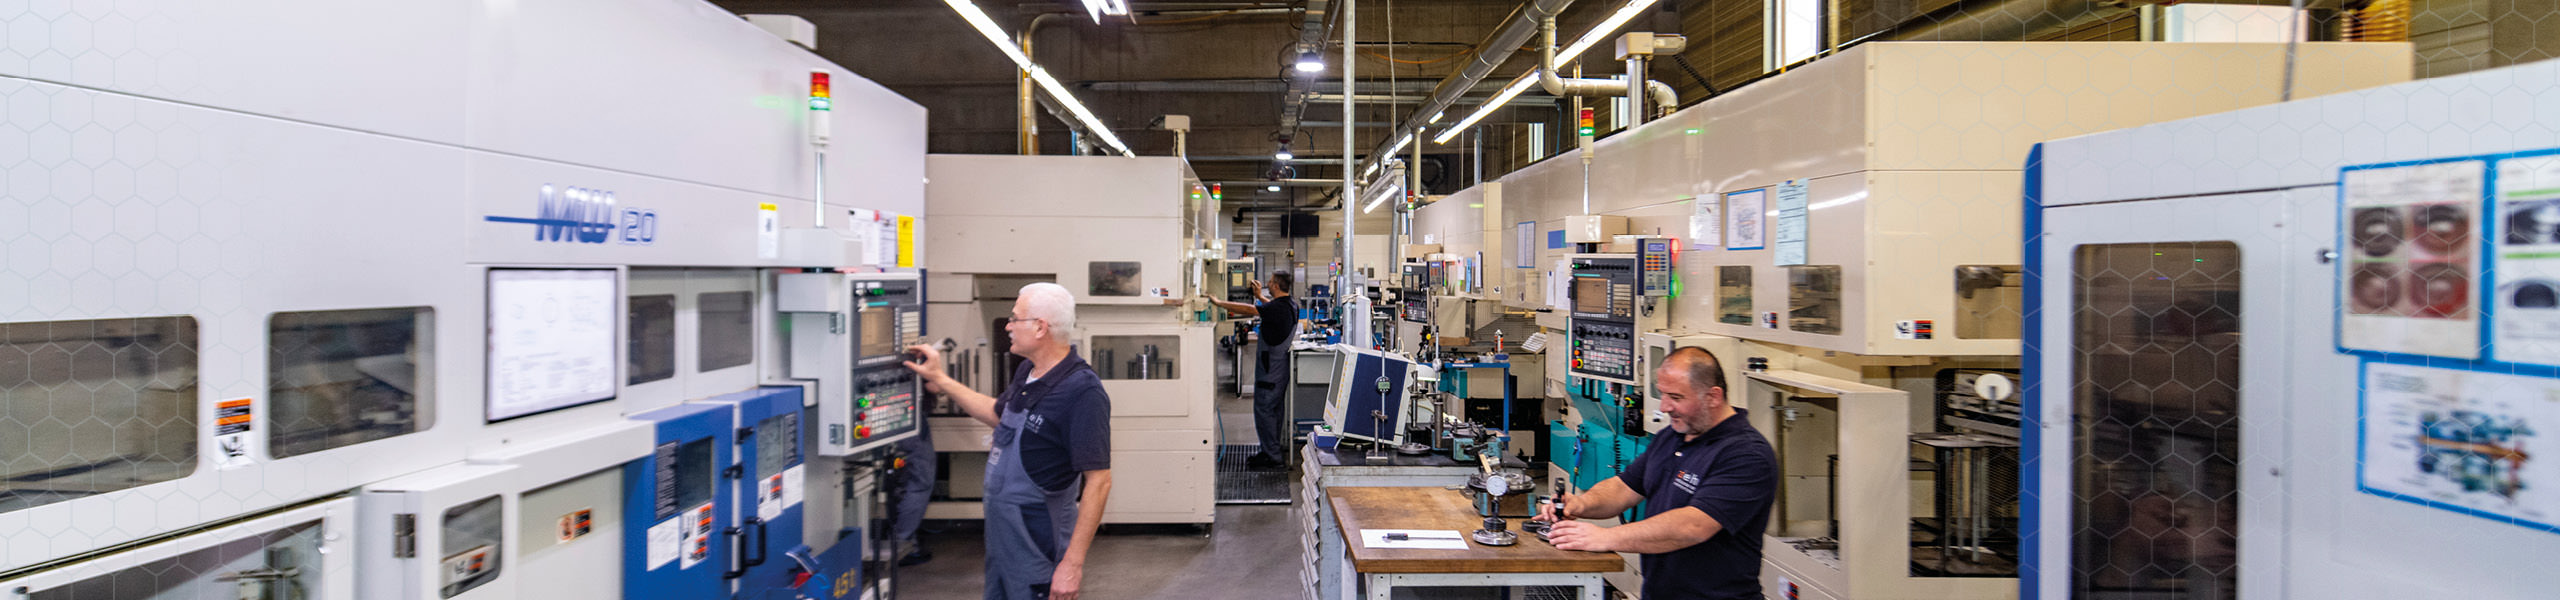 Zeh Präzision Maschinengang - Produktion